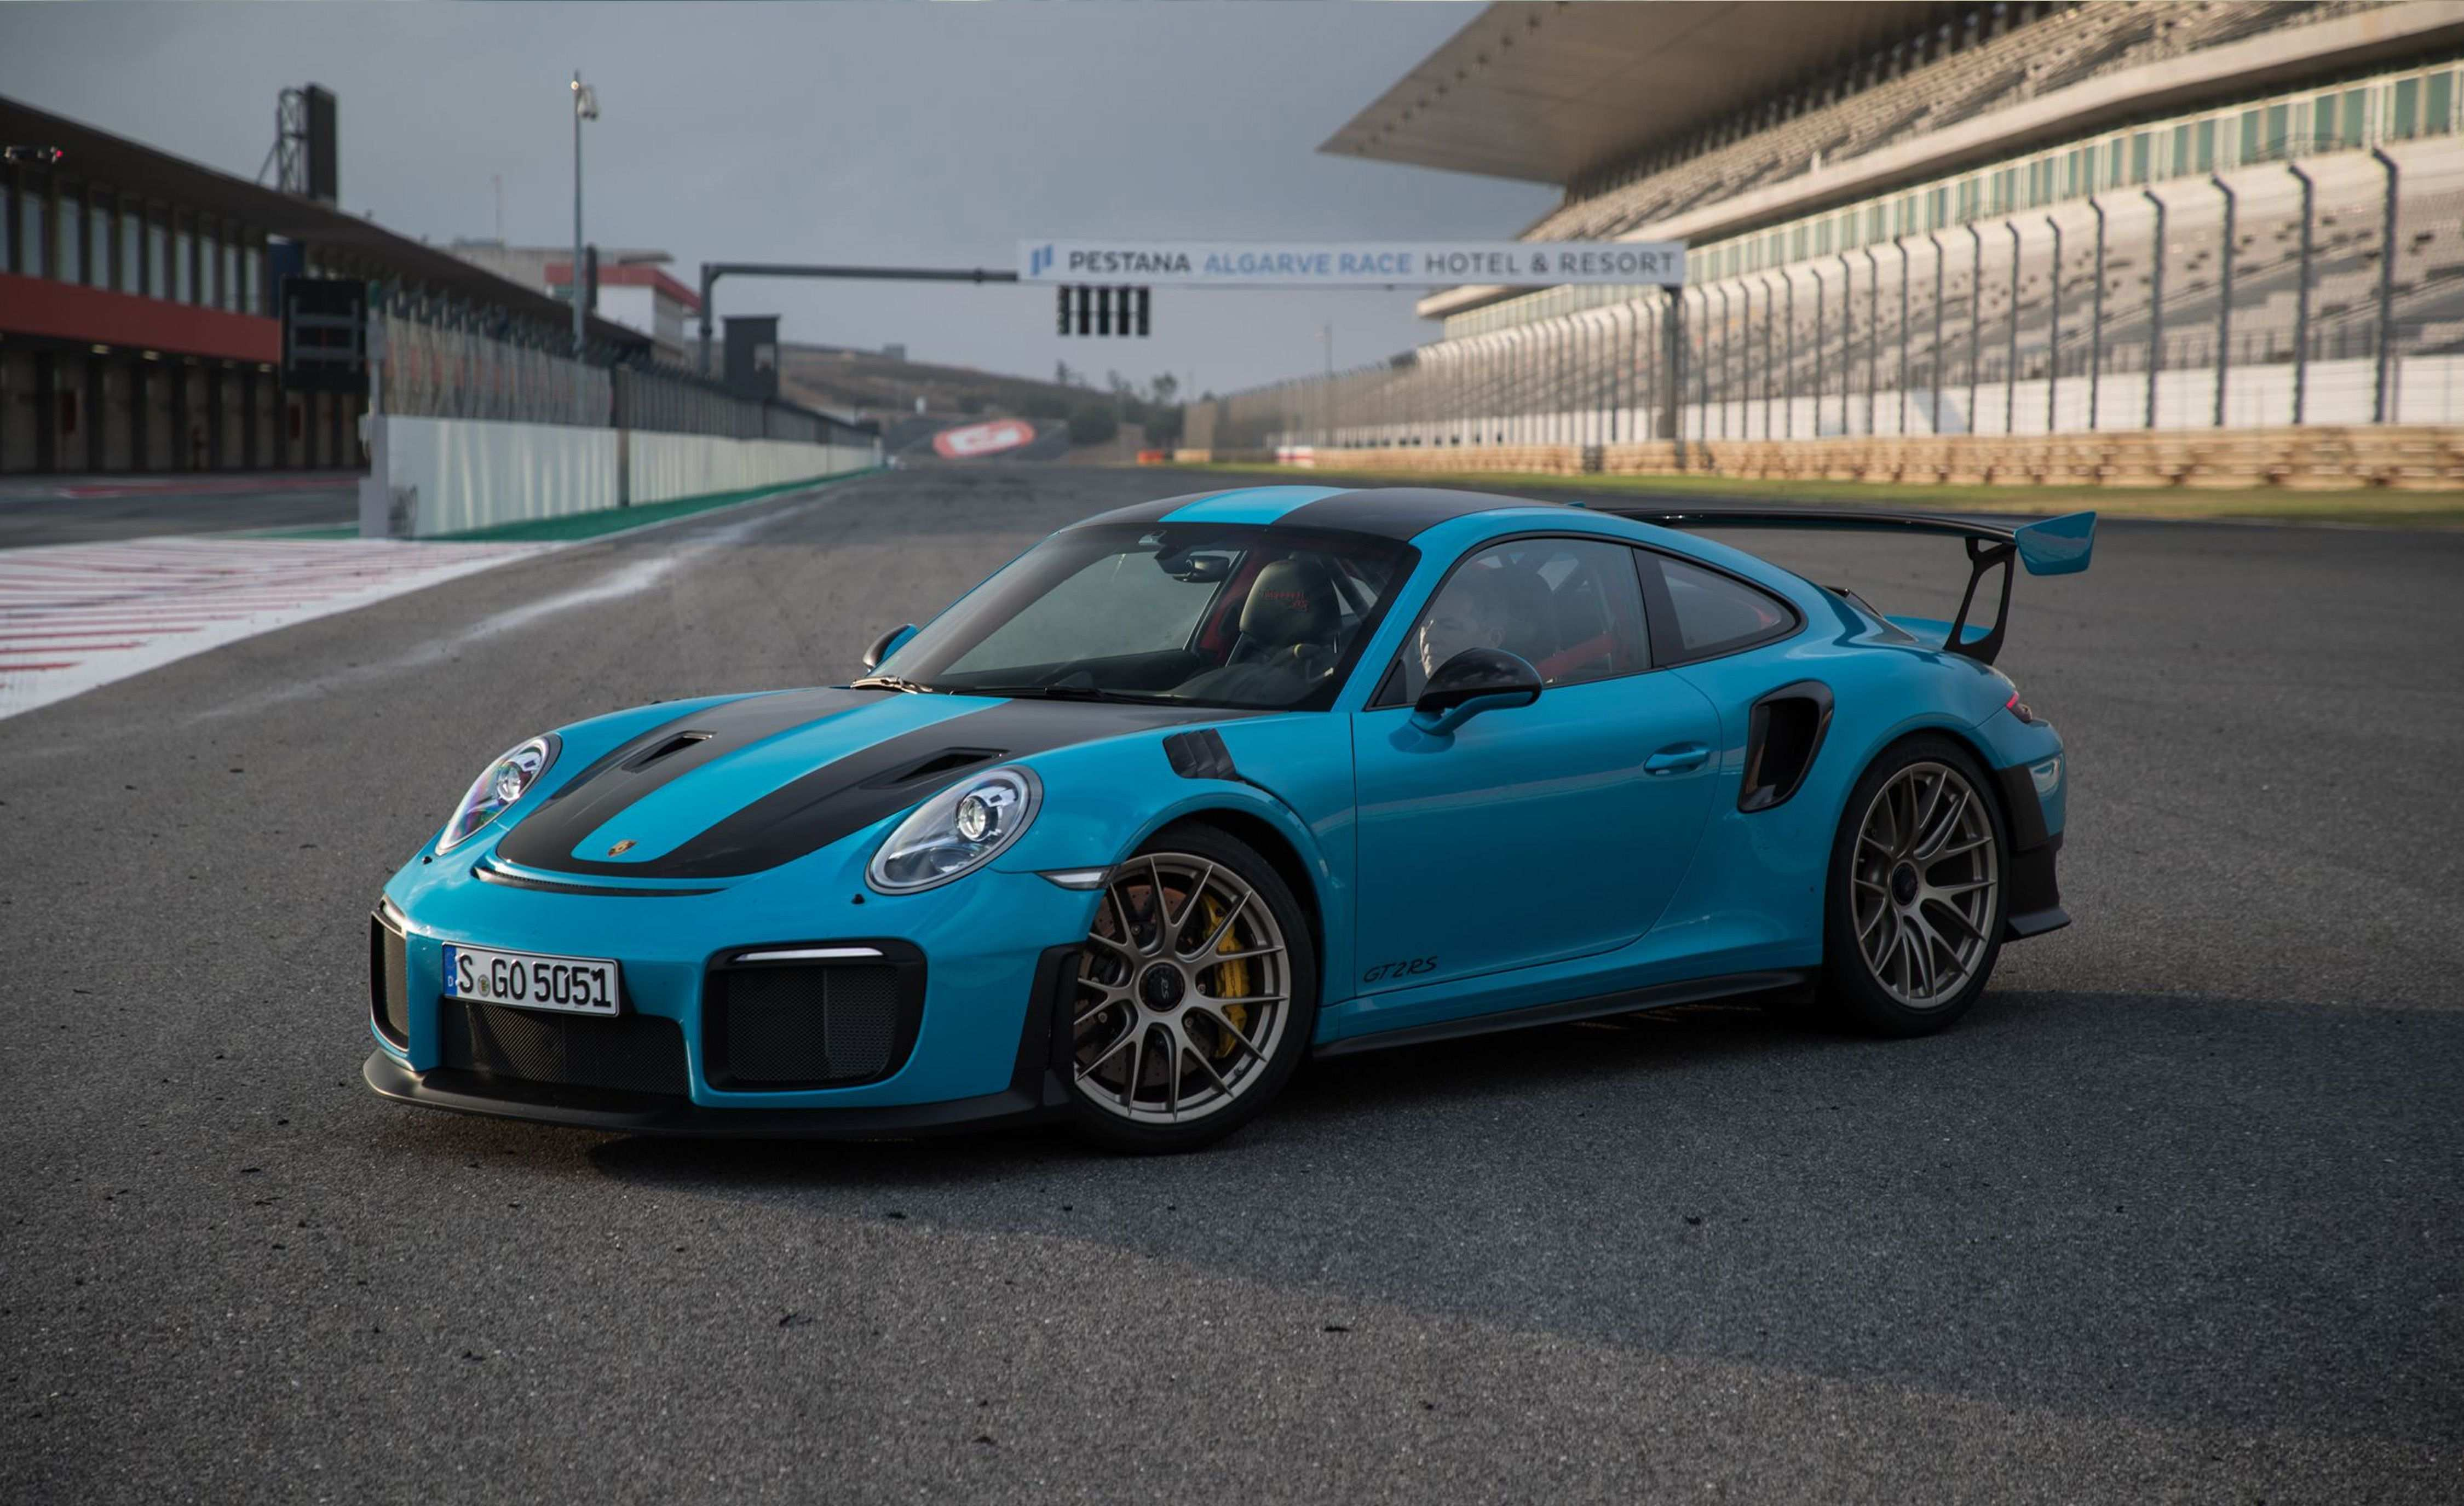 62 Great 2019 Porsche Gt2 Rs Spesification with 2019 Porsche Gt2 Rs